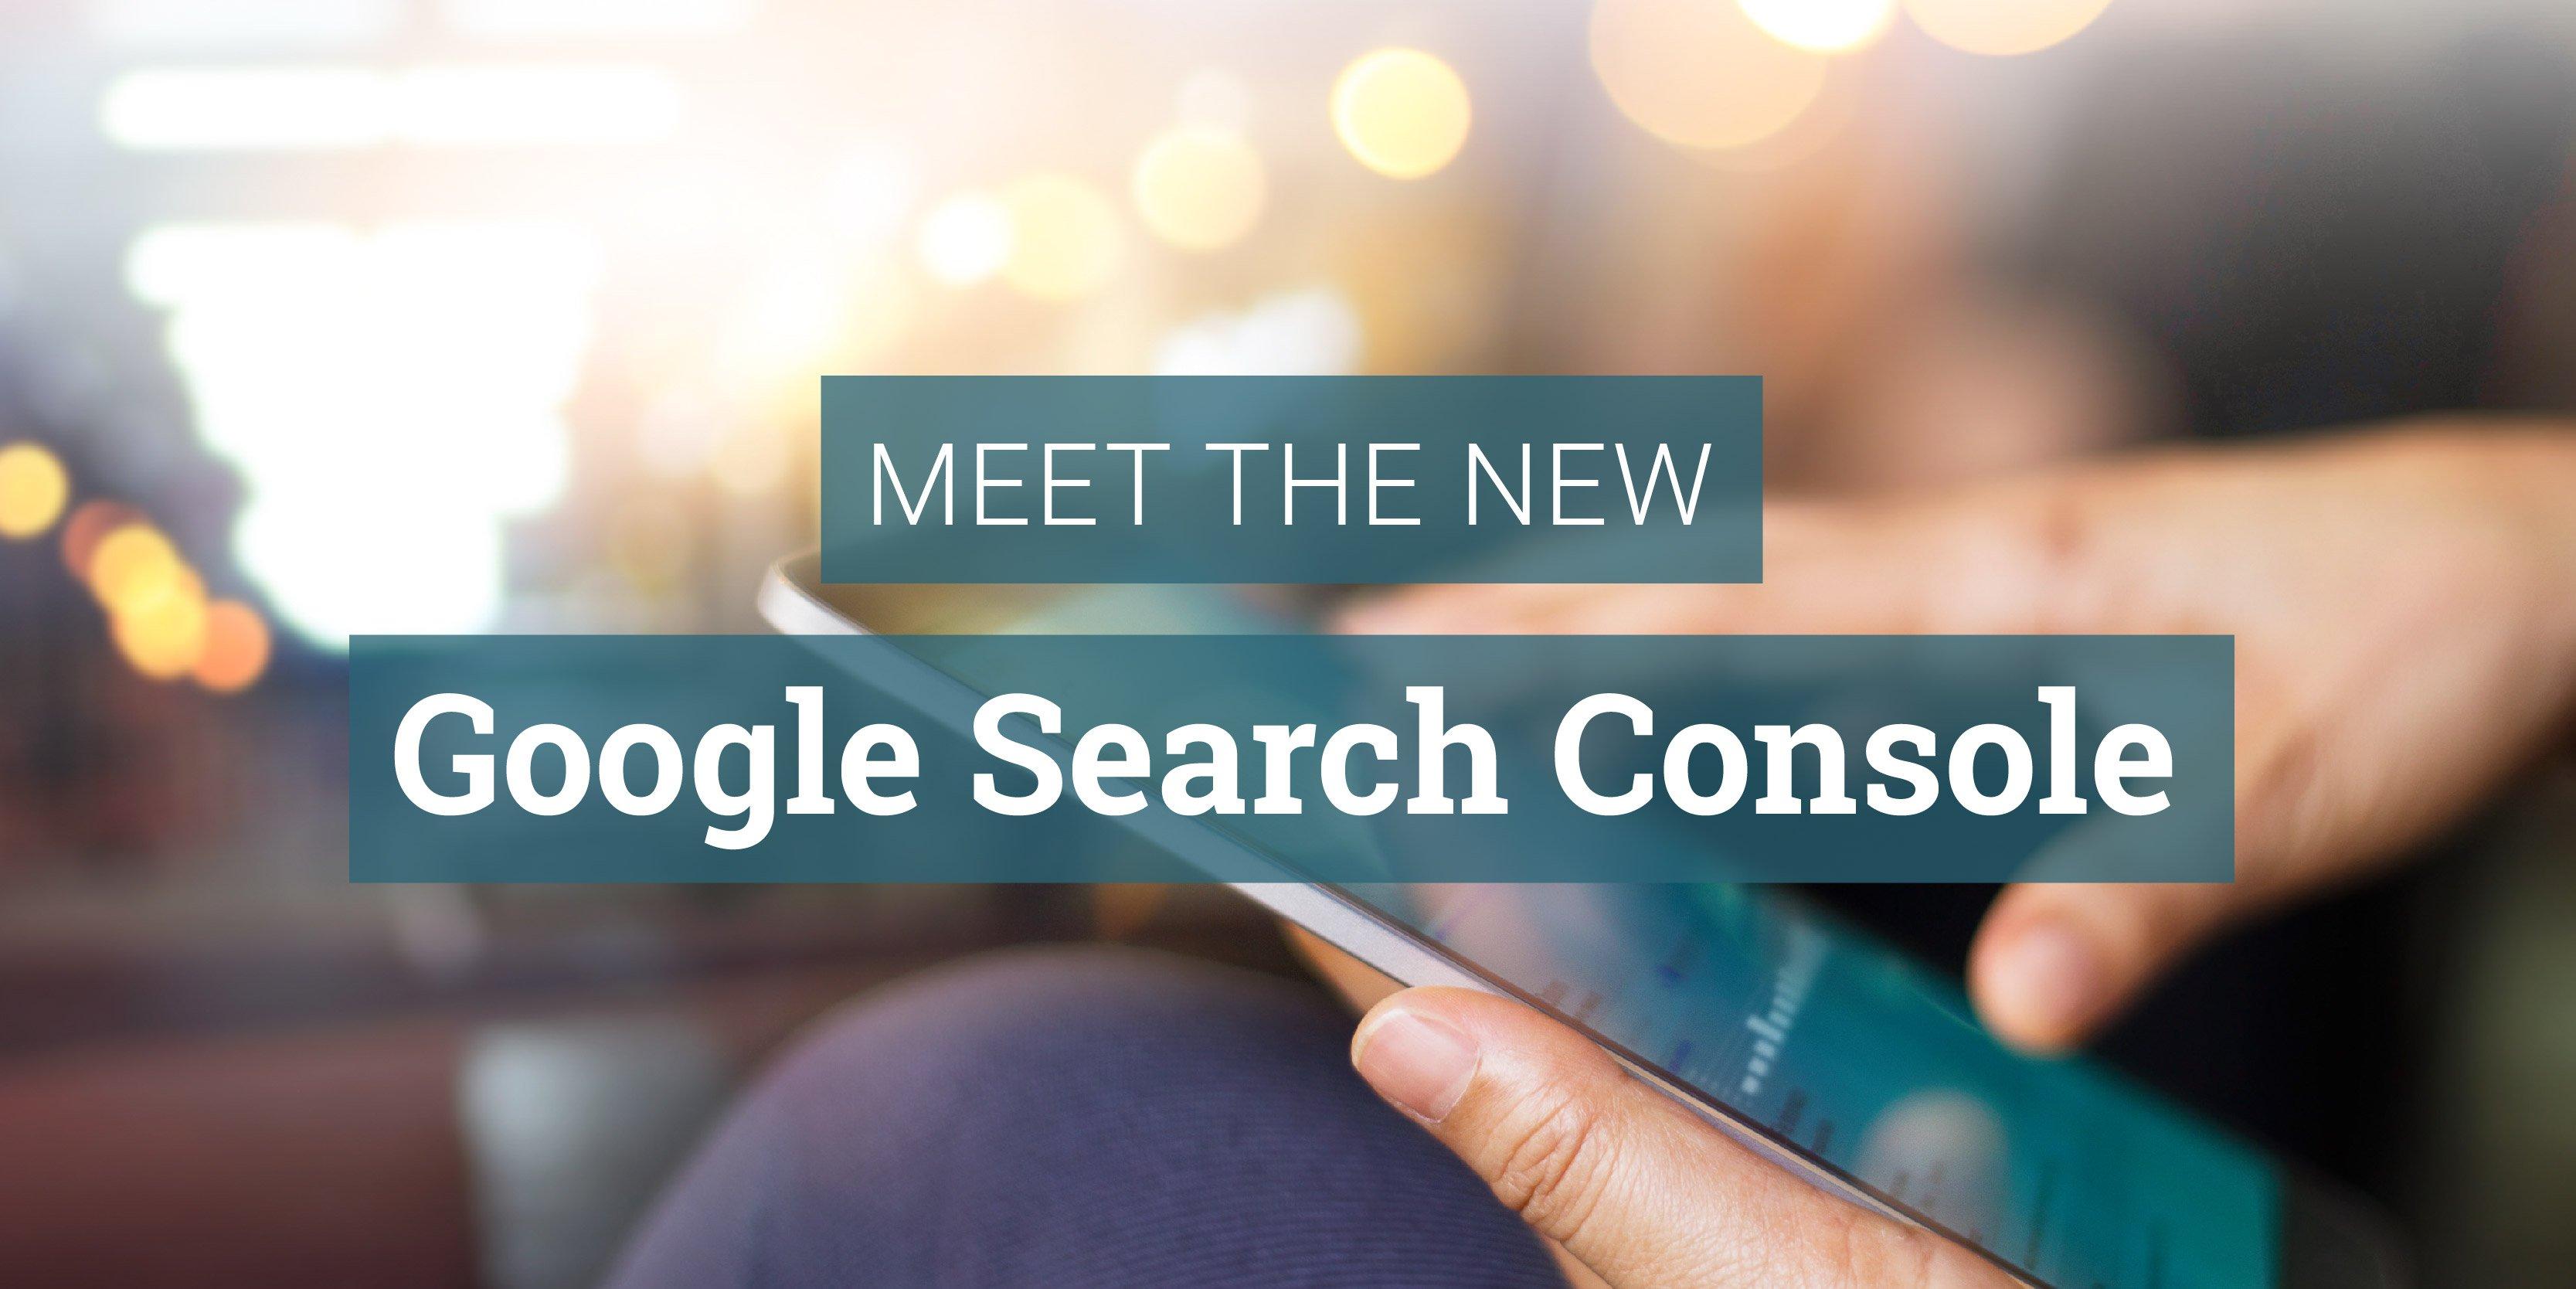 googlesearchconsole-07